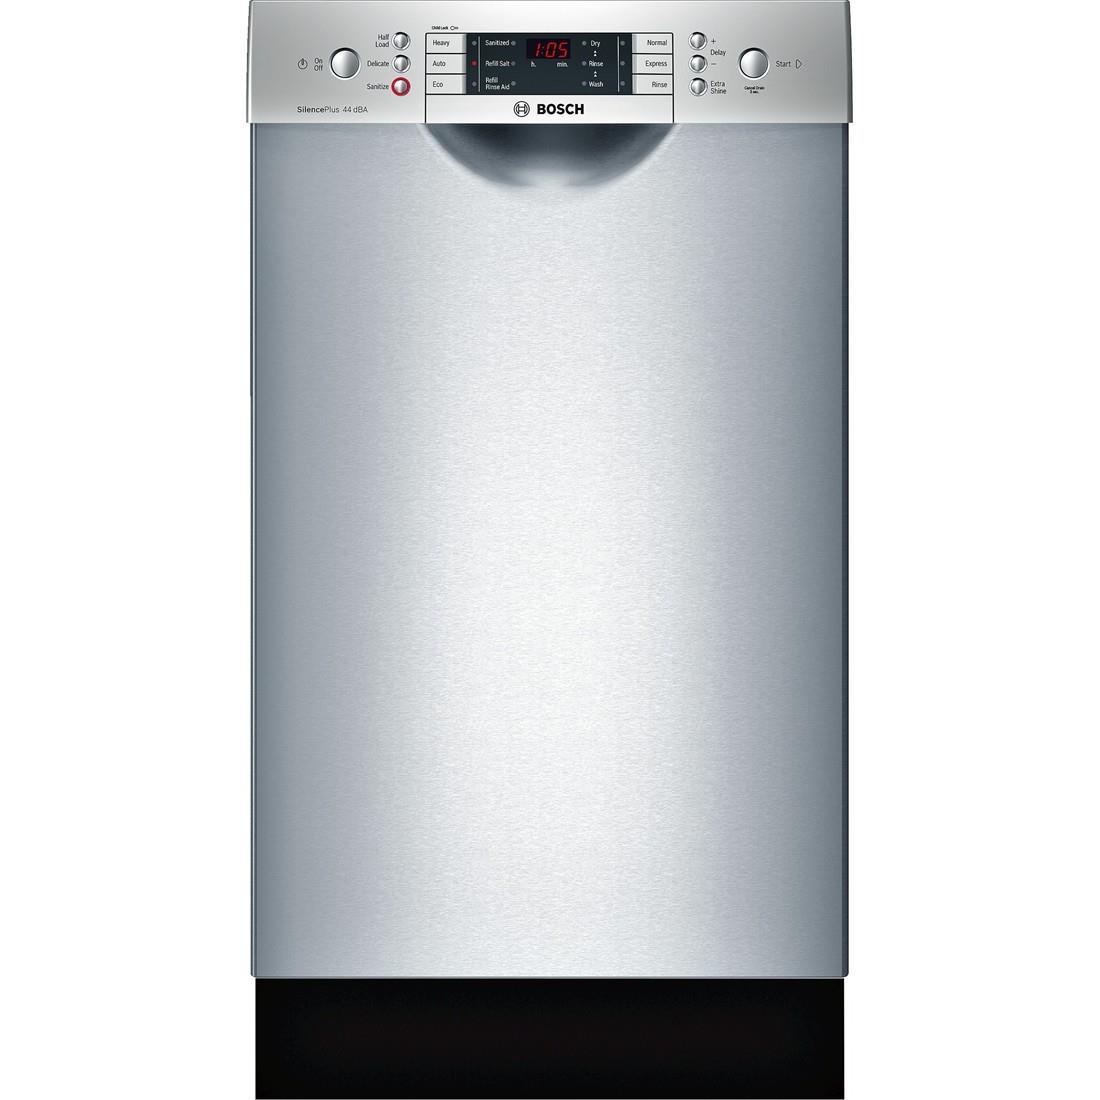 "Bosch Dishwashers 18"" Built-In Dishwasher - Item Number: SPE68U55UC"